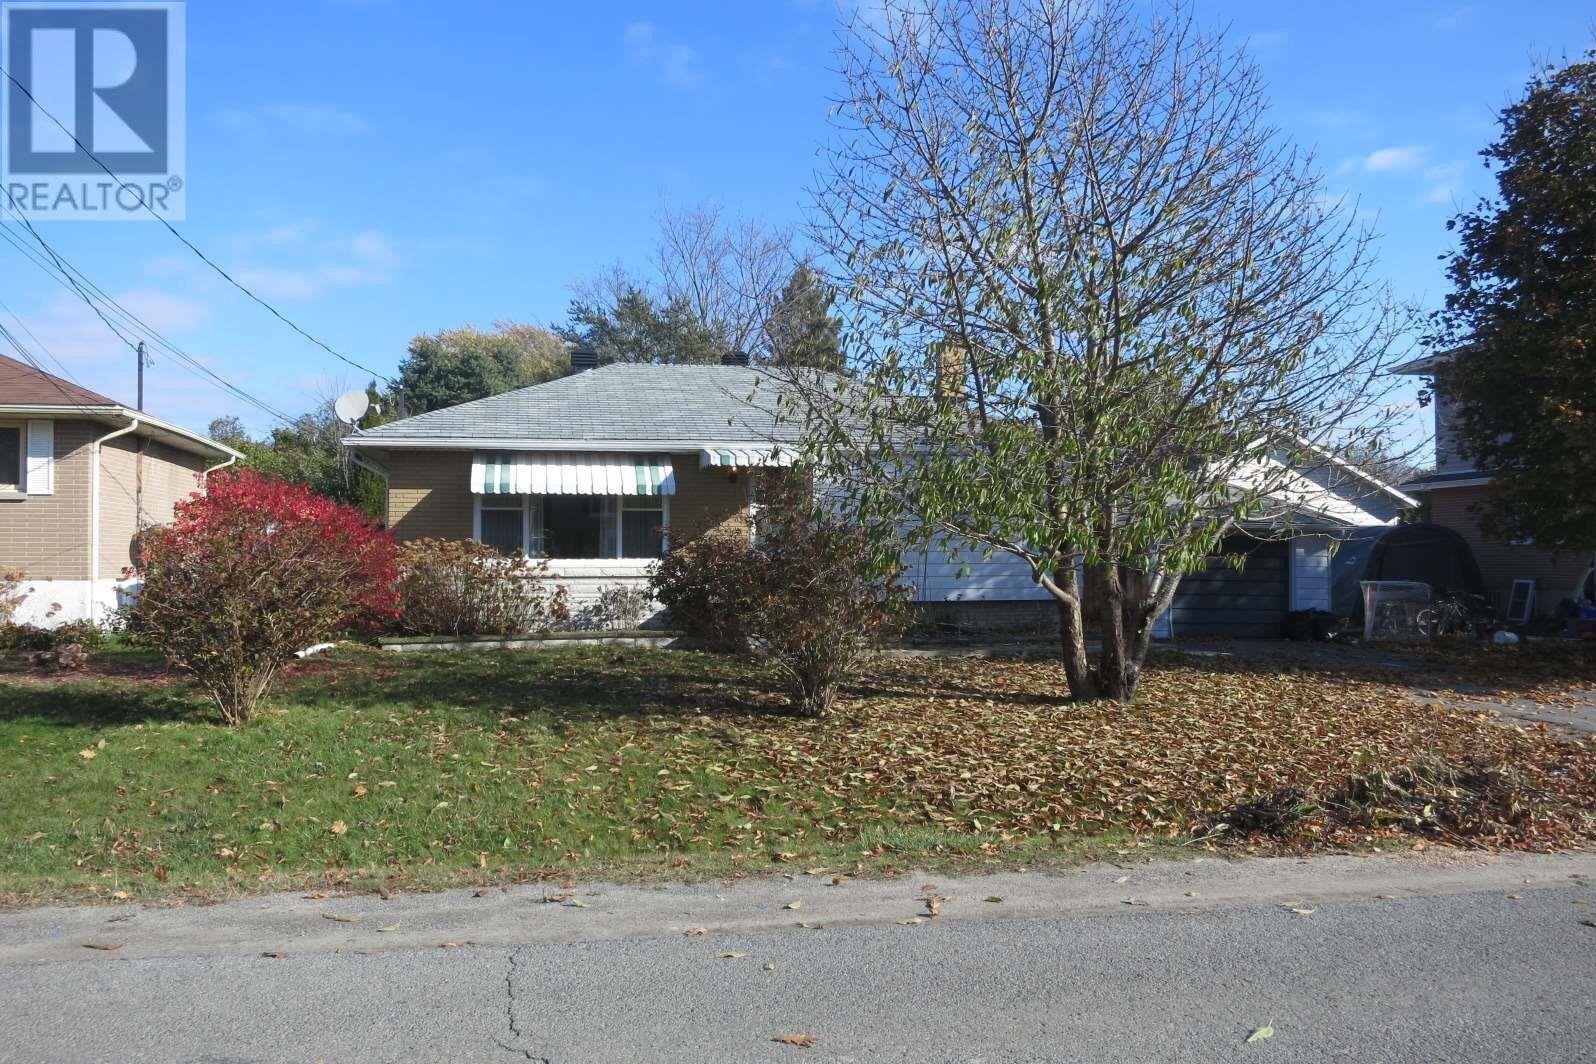 House for sale at 270 Mcewen Dr Kingston Ontario - MLS: K20006364